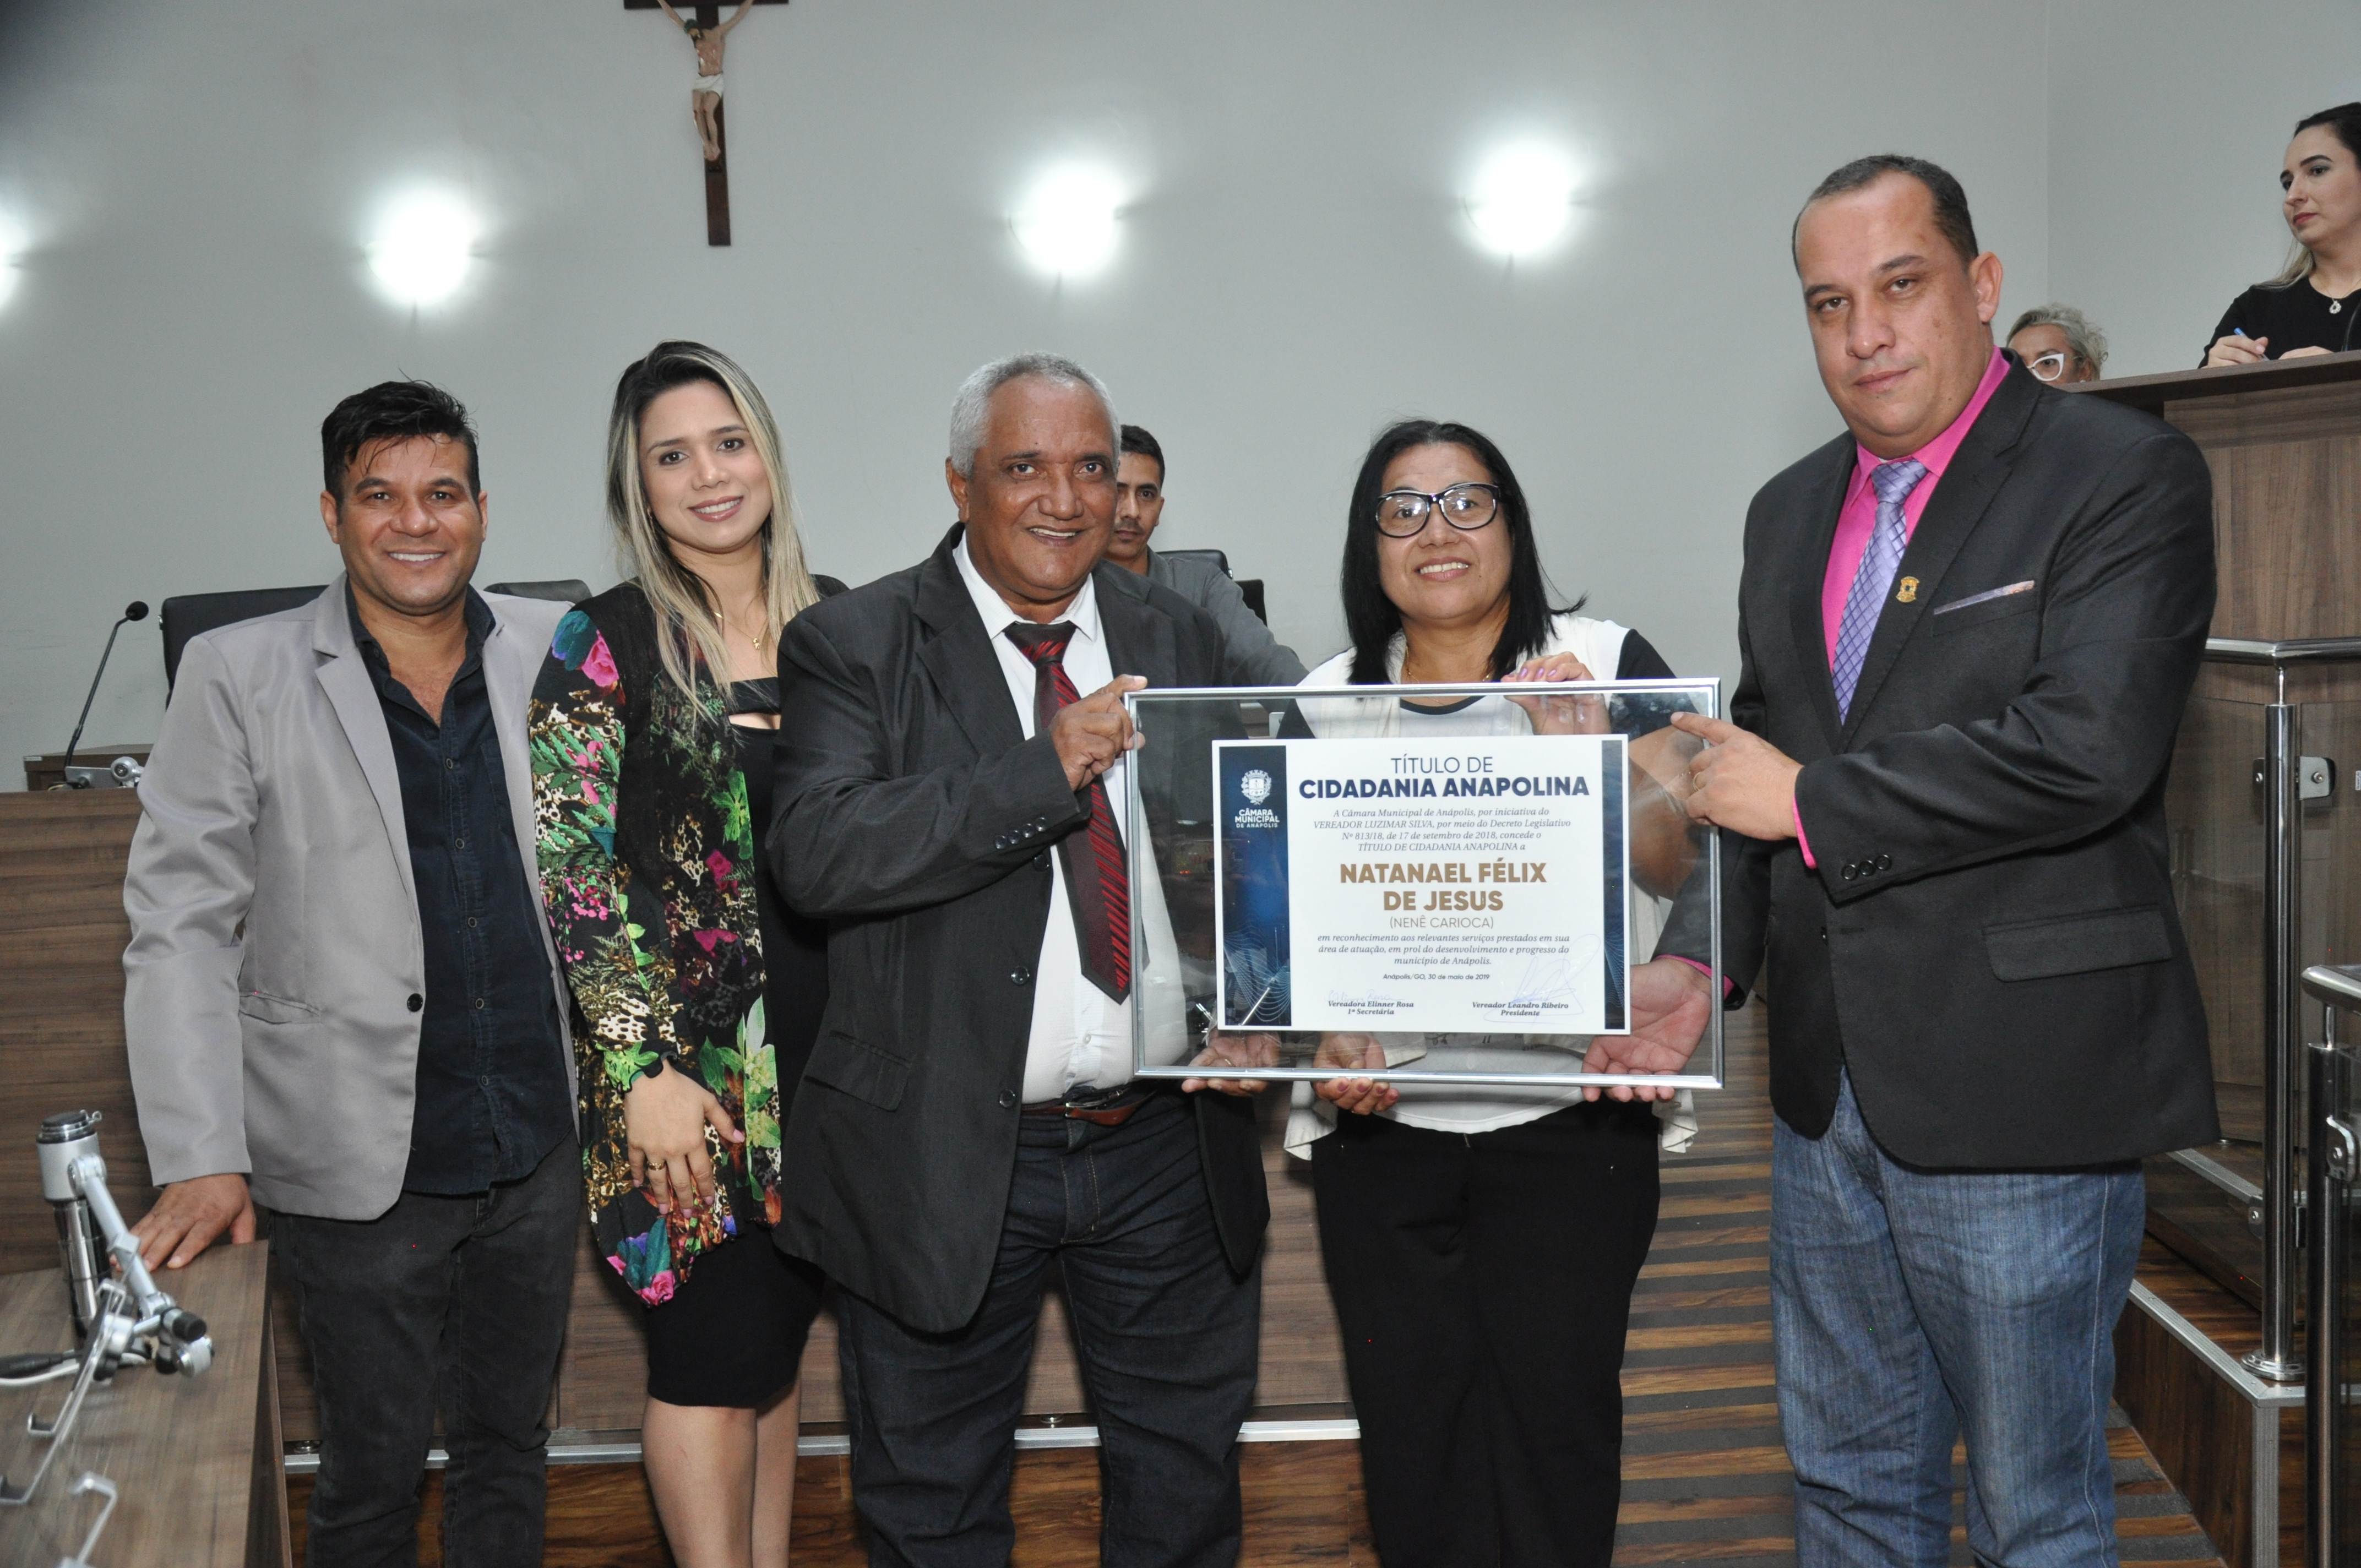 Câmara concede título de cidadania anapolina a Natanael Felix de Jesus, o Nenê Carioca